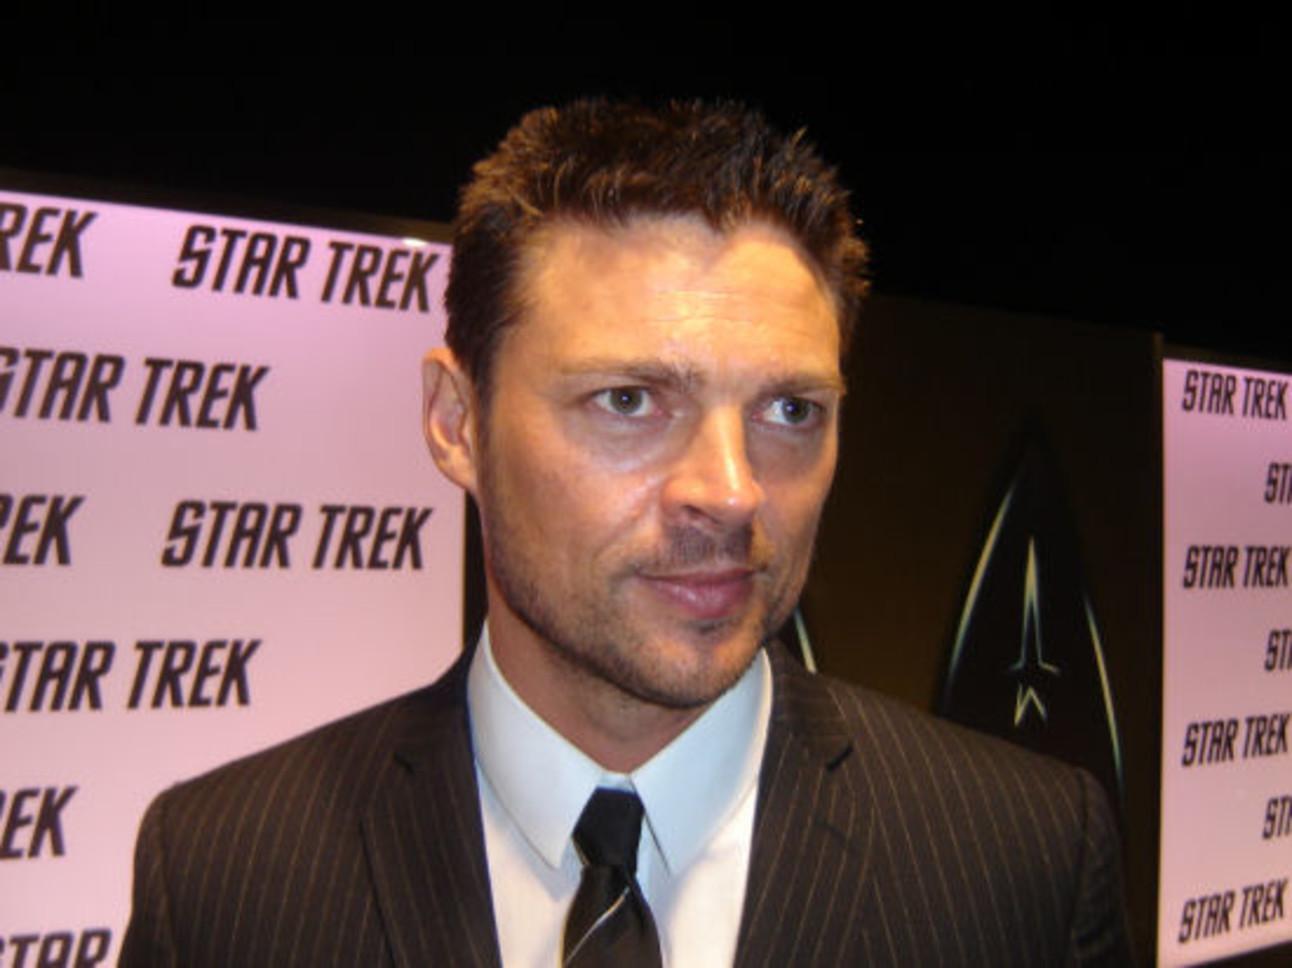 Star_Trek_Priest_Urban.jpg